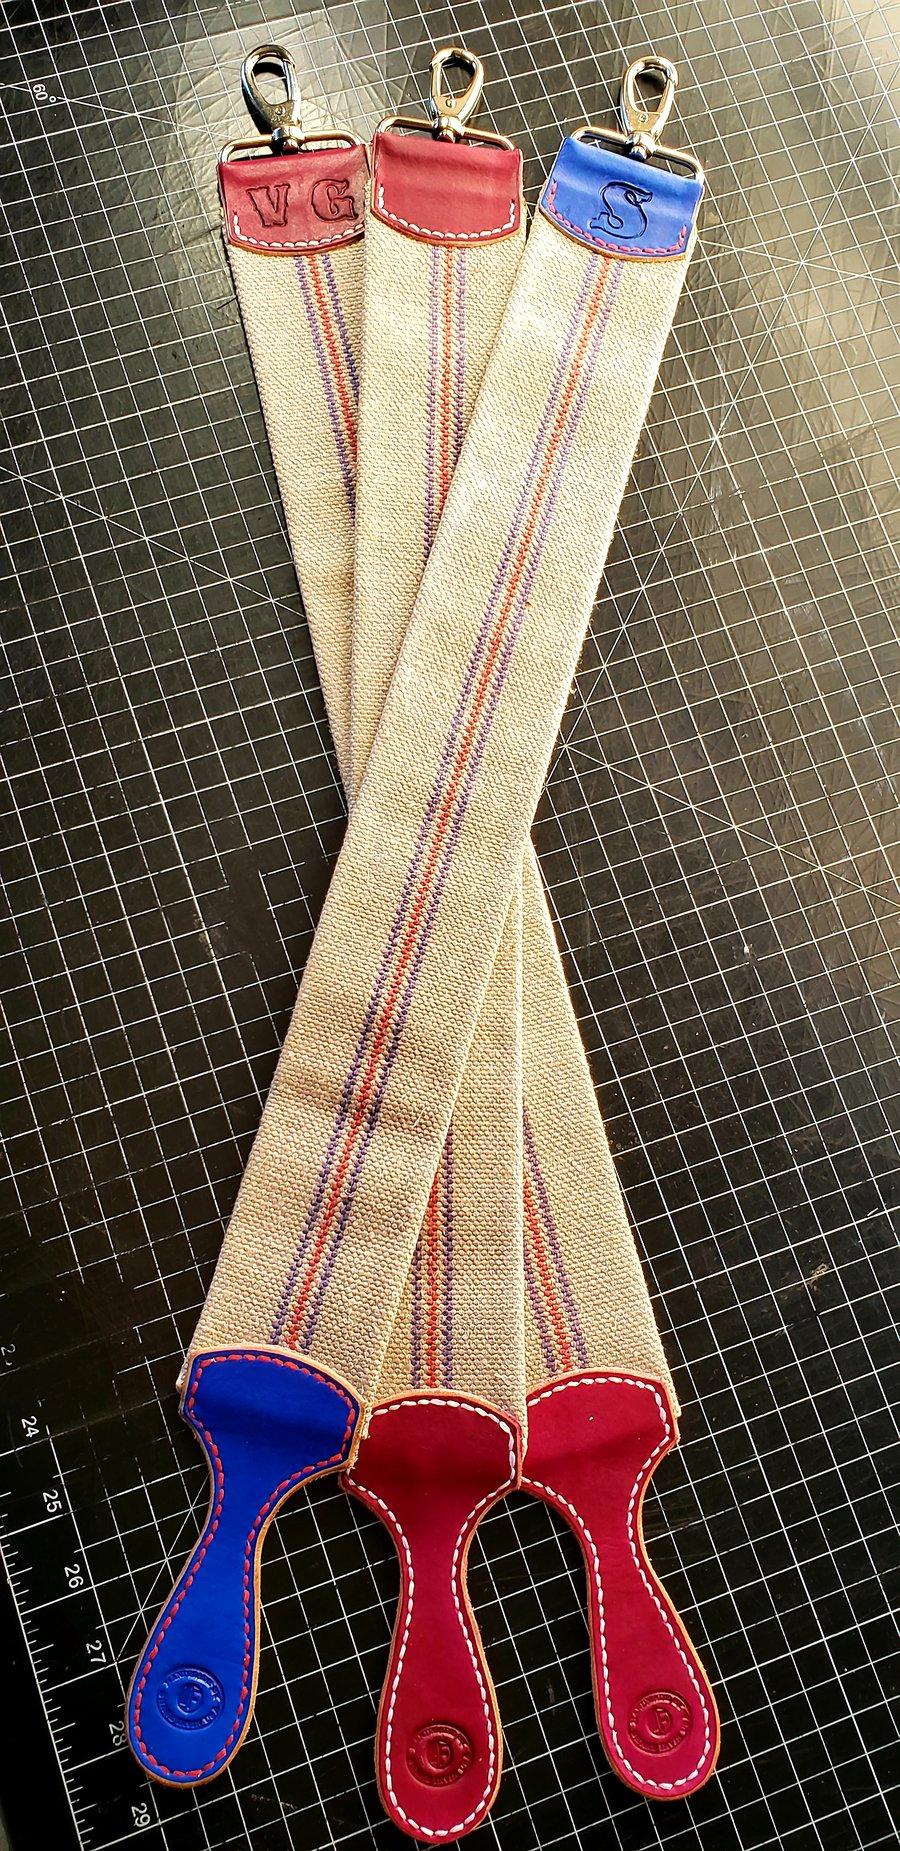 Image of Custom Vintage Linen Fire Hose Strop. For straight razors or knives.